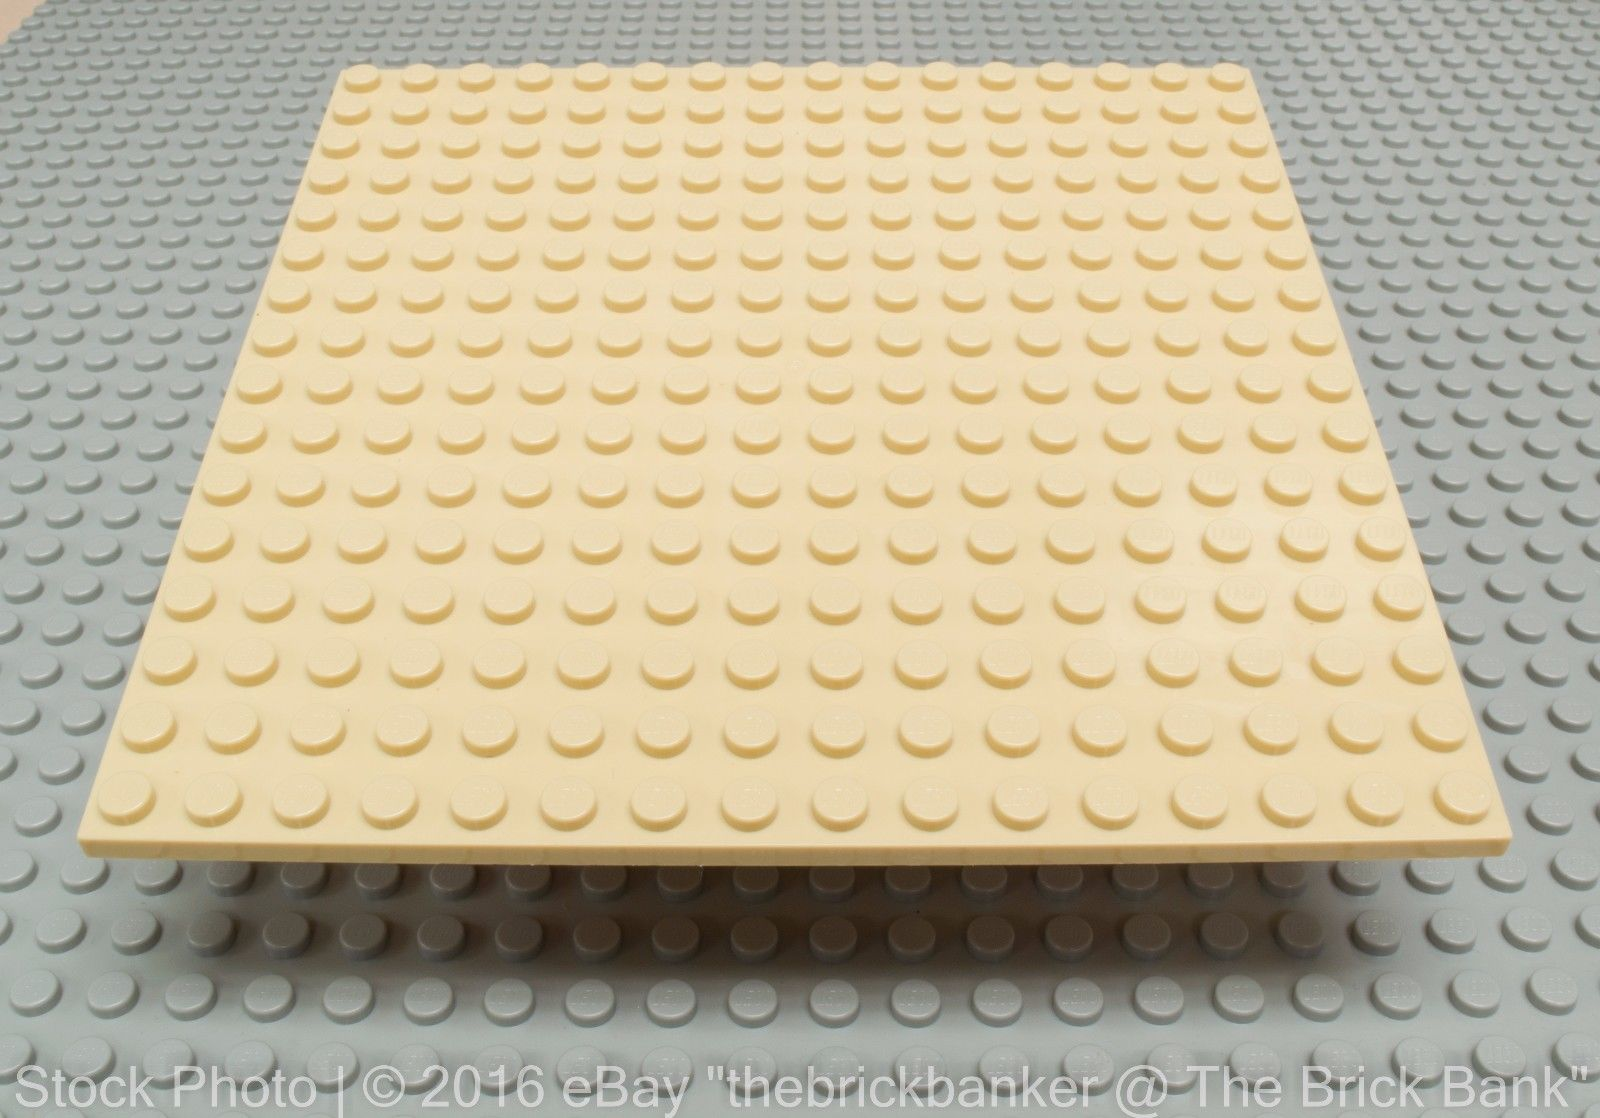 LEGO TAN FLAT PLATFORM BASE PLATE 16 X 16 STUD 5 BY 5 INCH